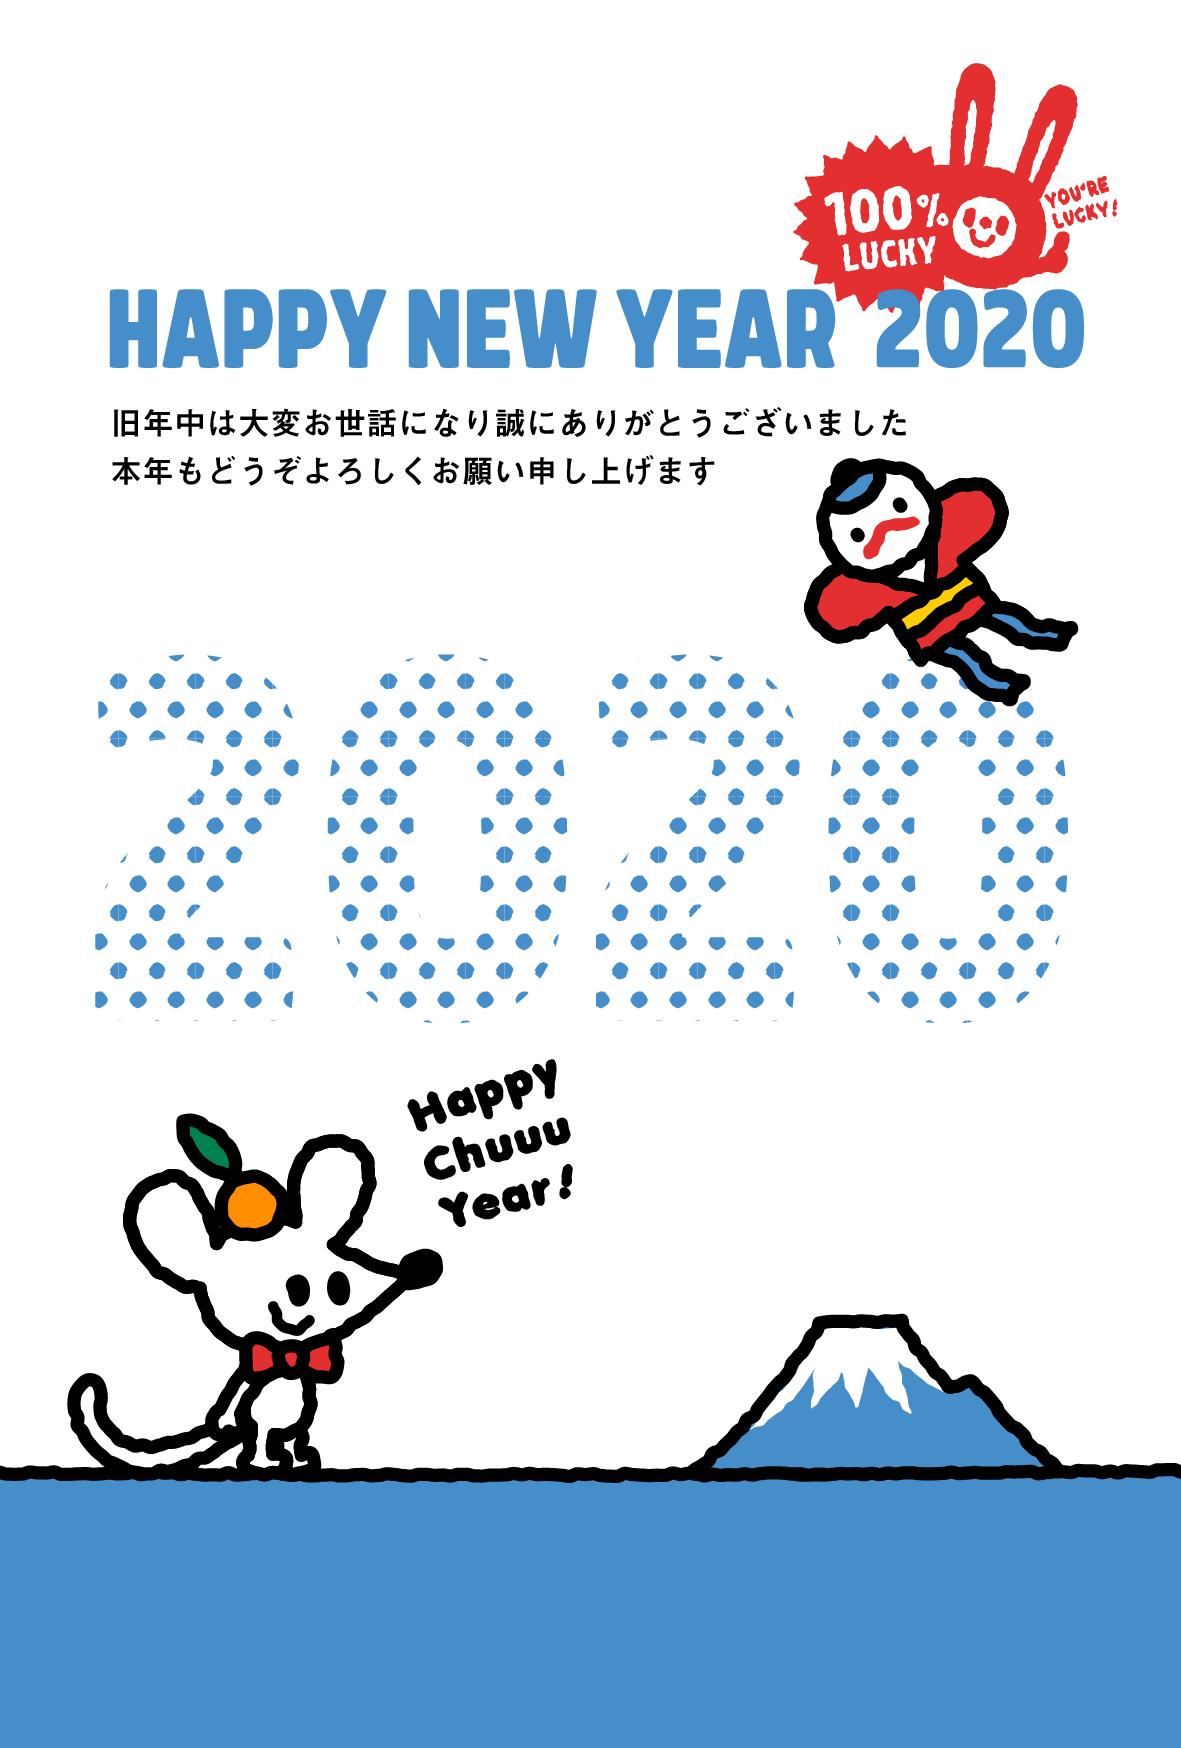 nenga2020-tarout-1004_08-illust.png